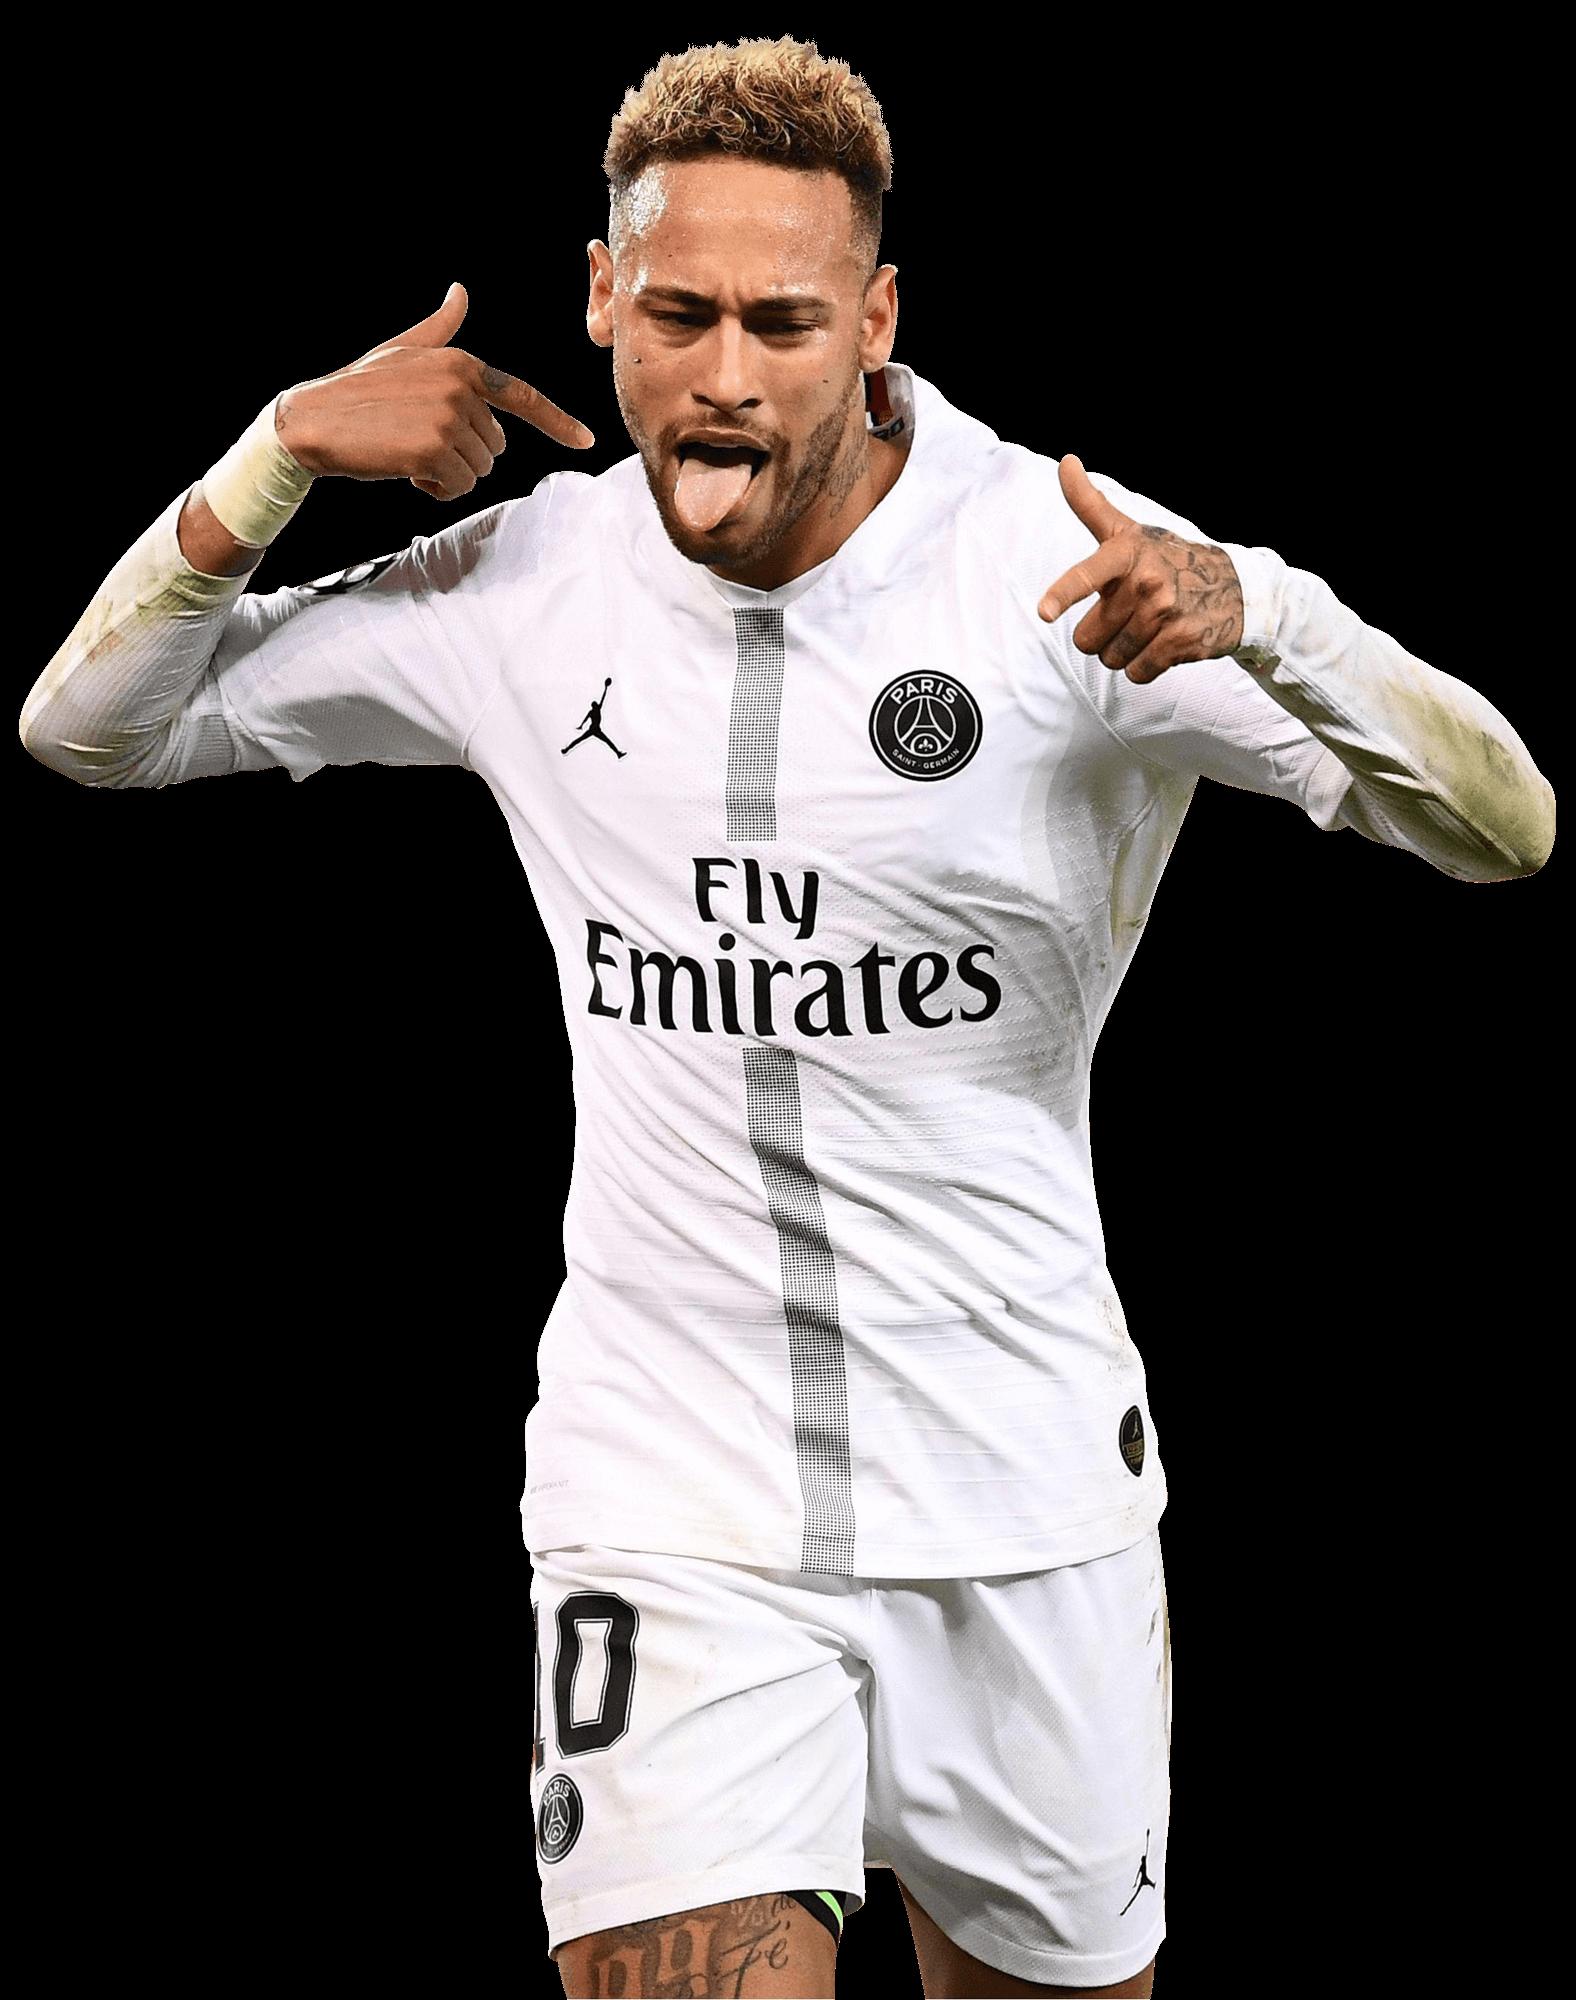 Neymar White PSG Jersey Png